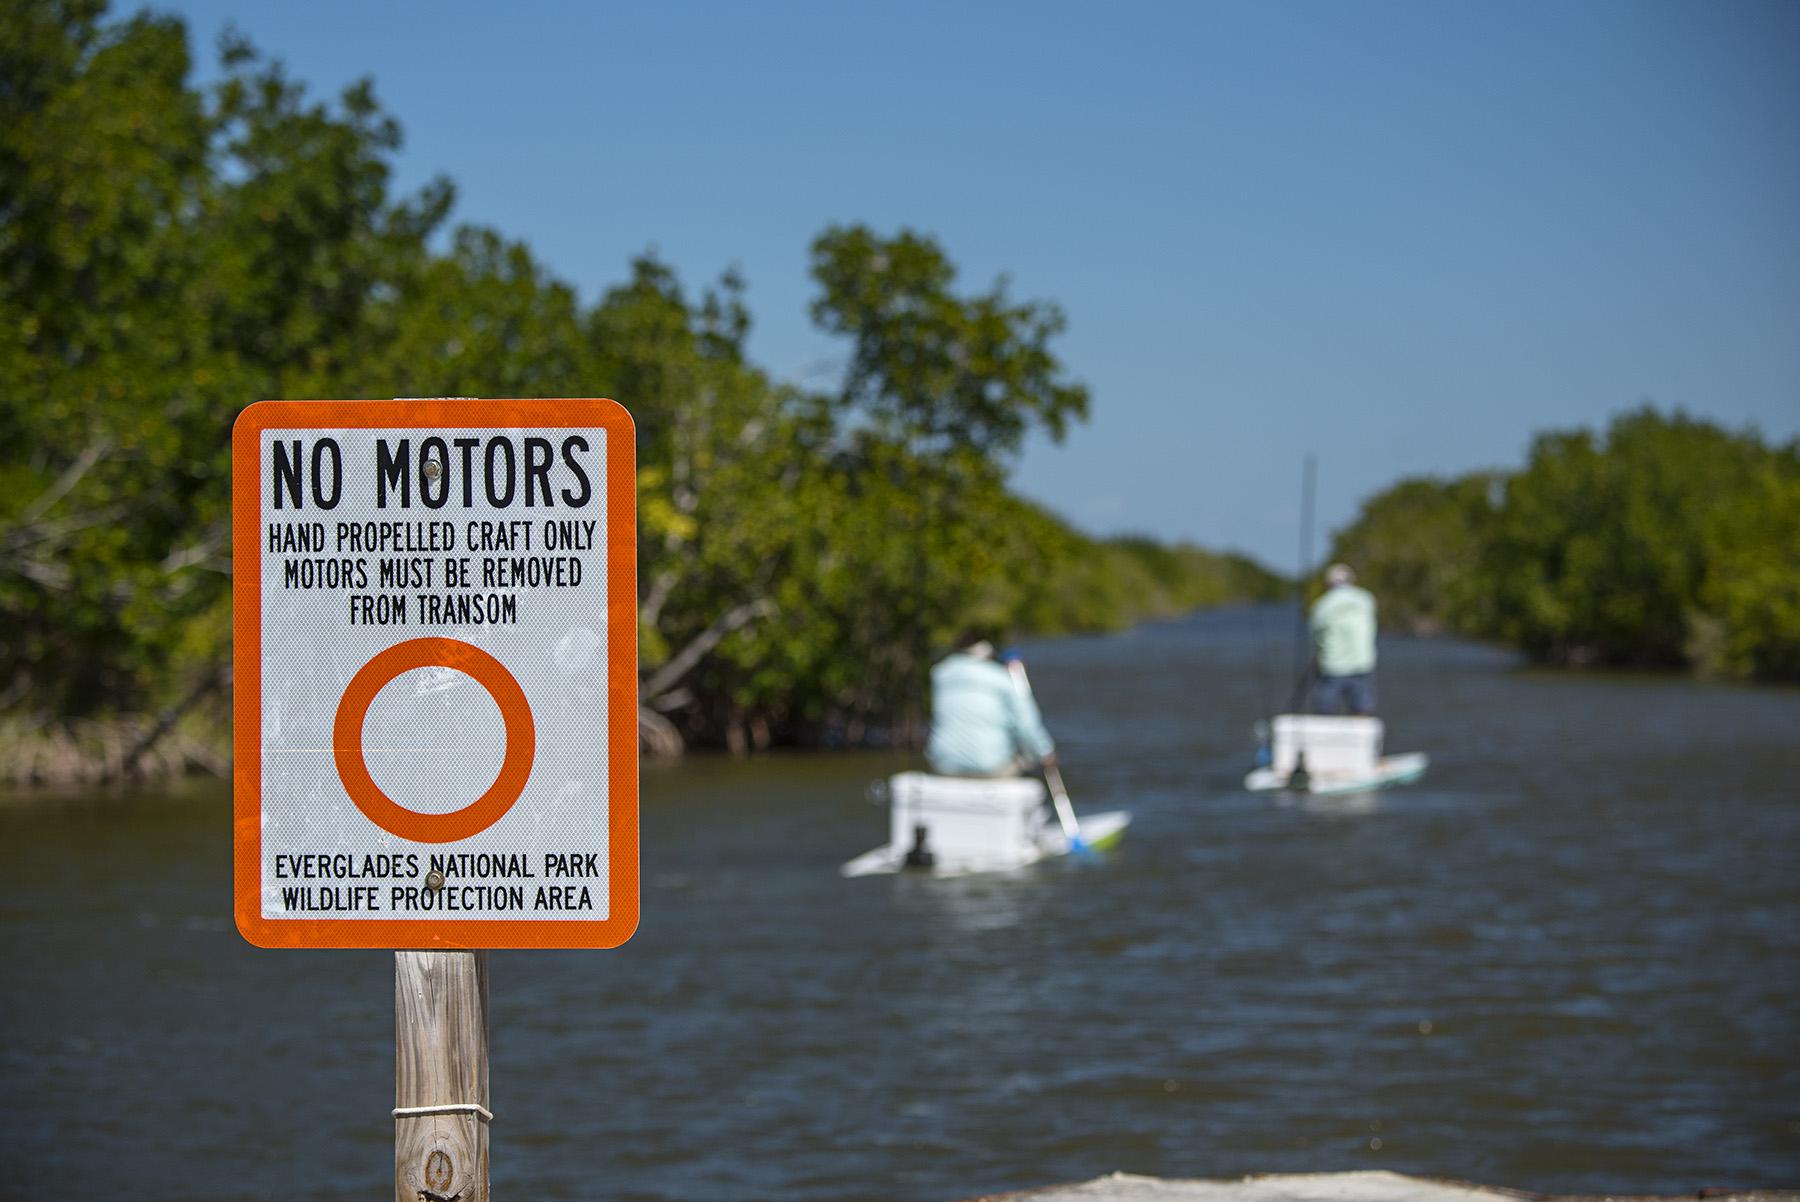 No motor zone